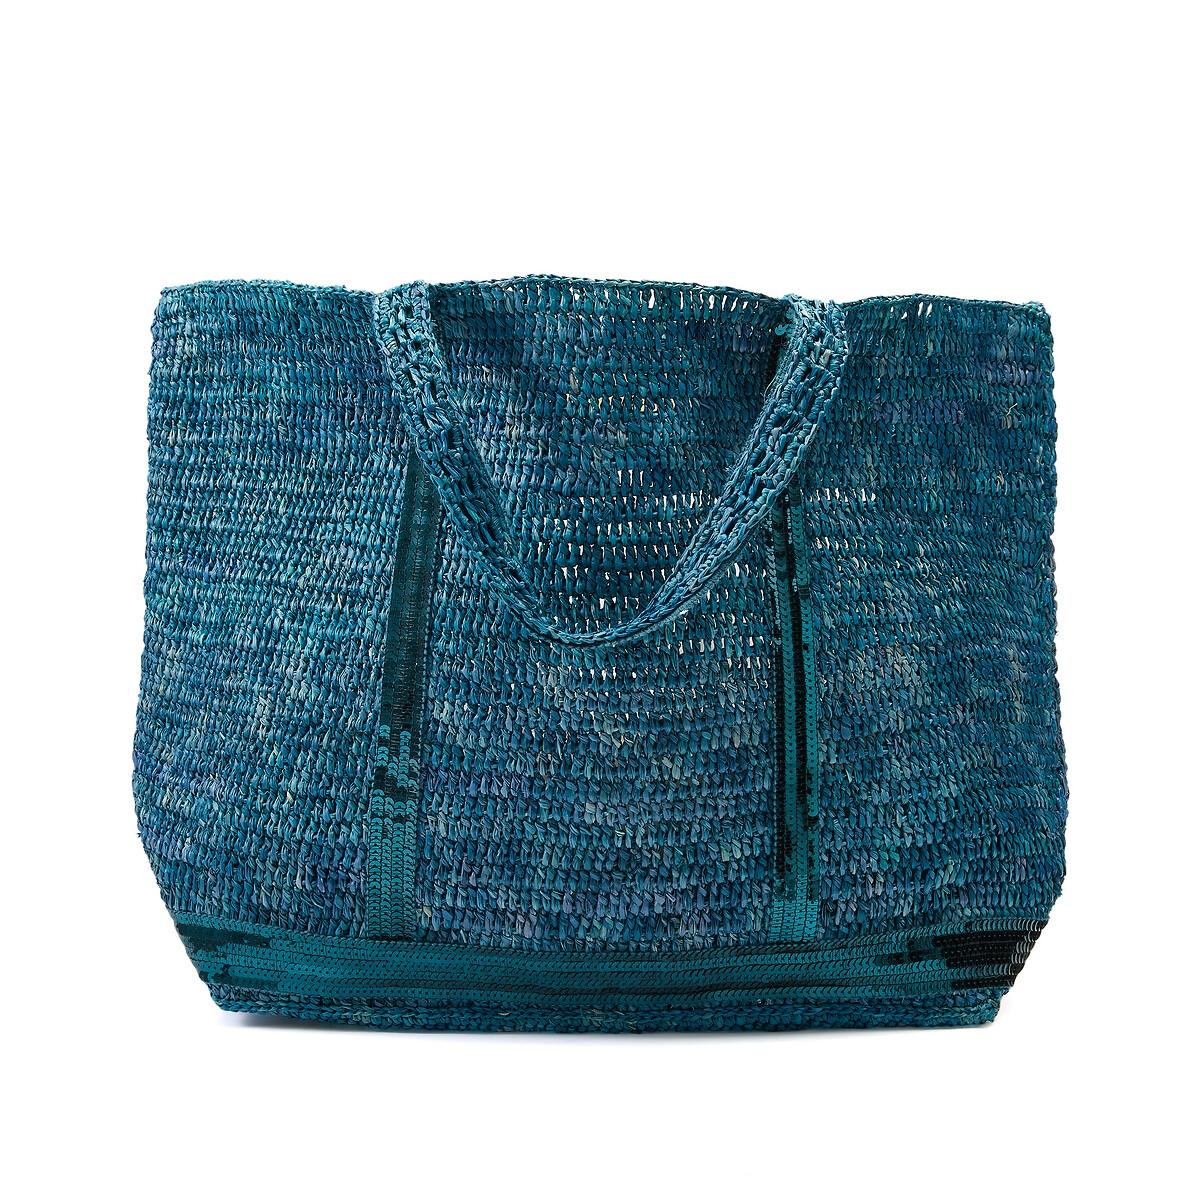 Фото - Сумка-шоппер La Redoute Из рафии с блестками единый размер синий сумка шоппер средняя из парусины с блестками